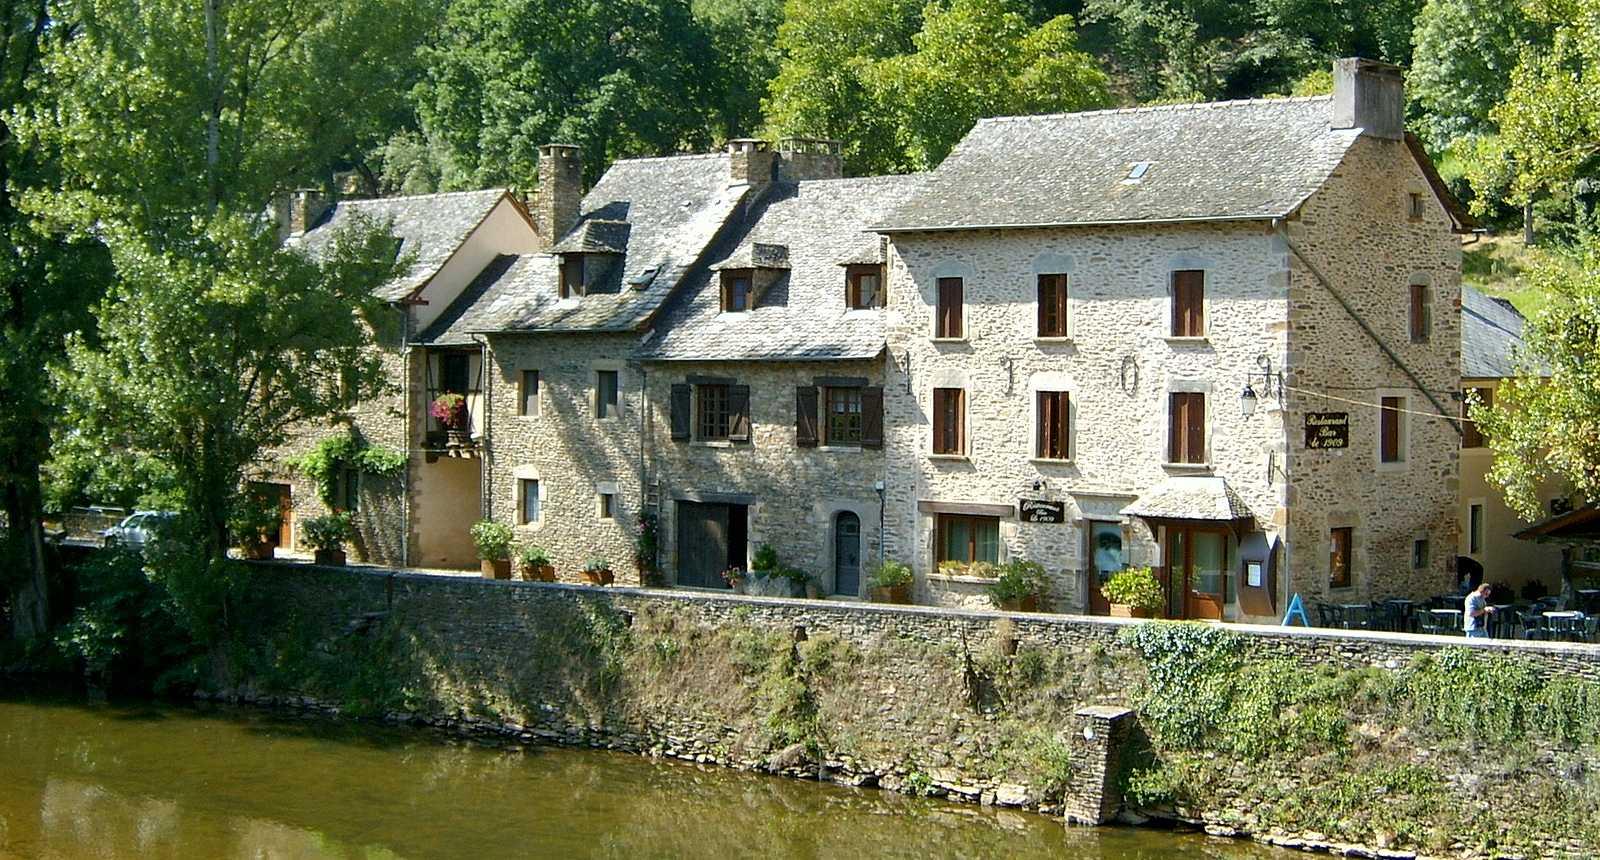 Le village typique de Belcastel